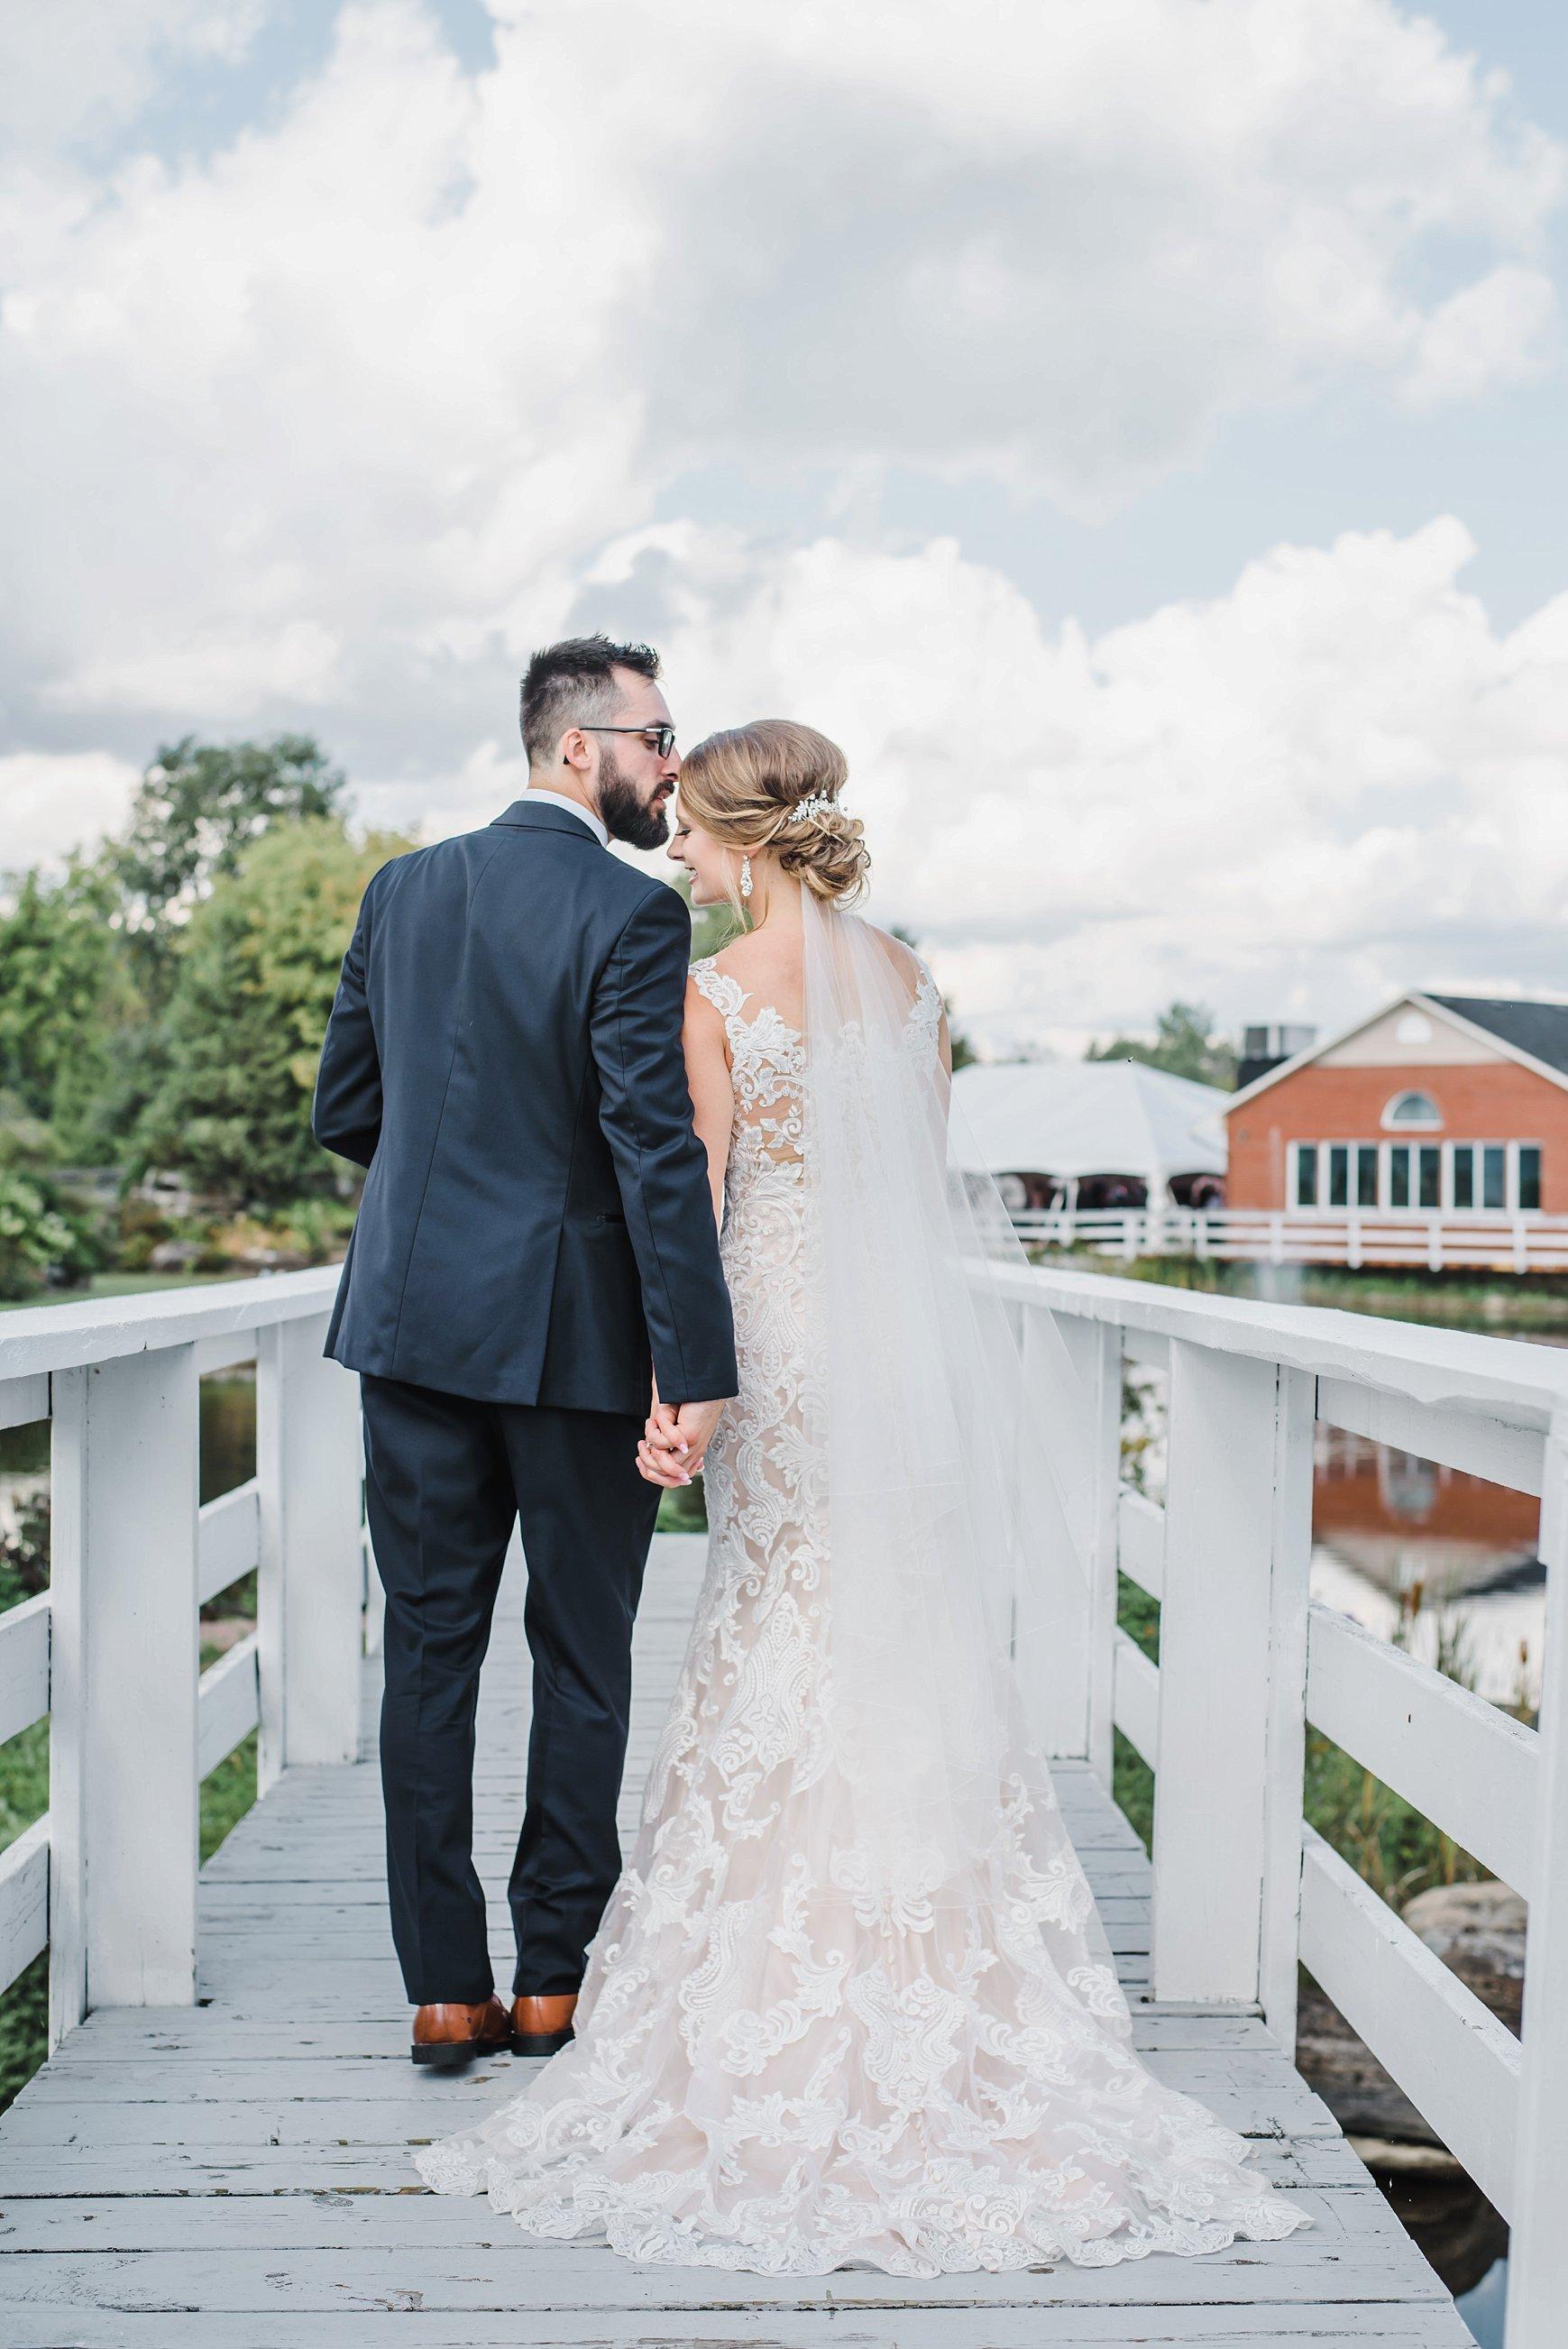 light airy indie fine art ottawa wedding photographer | Ali and Batoul Photography_1290.jpg